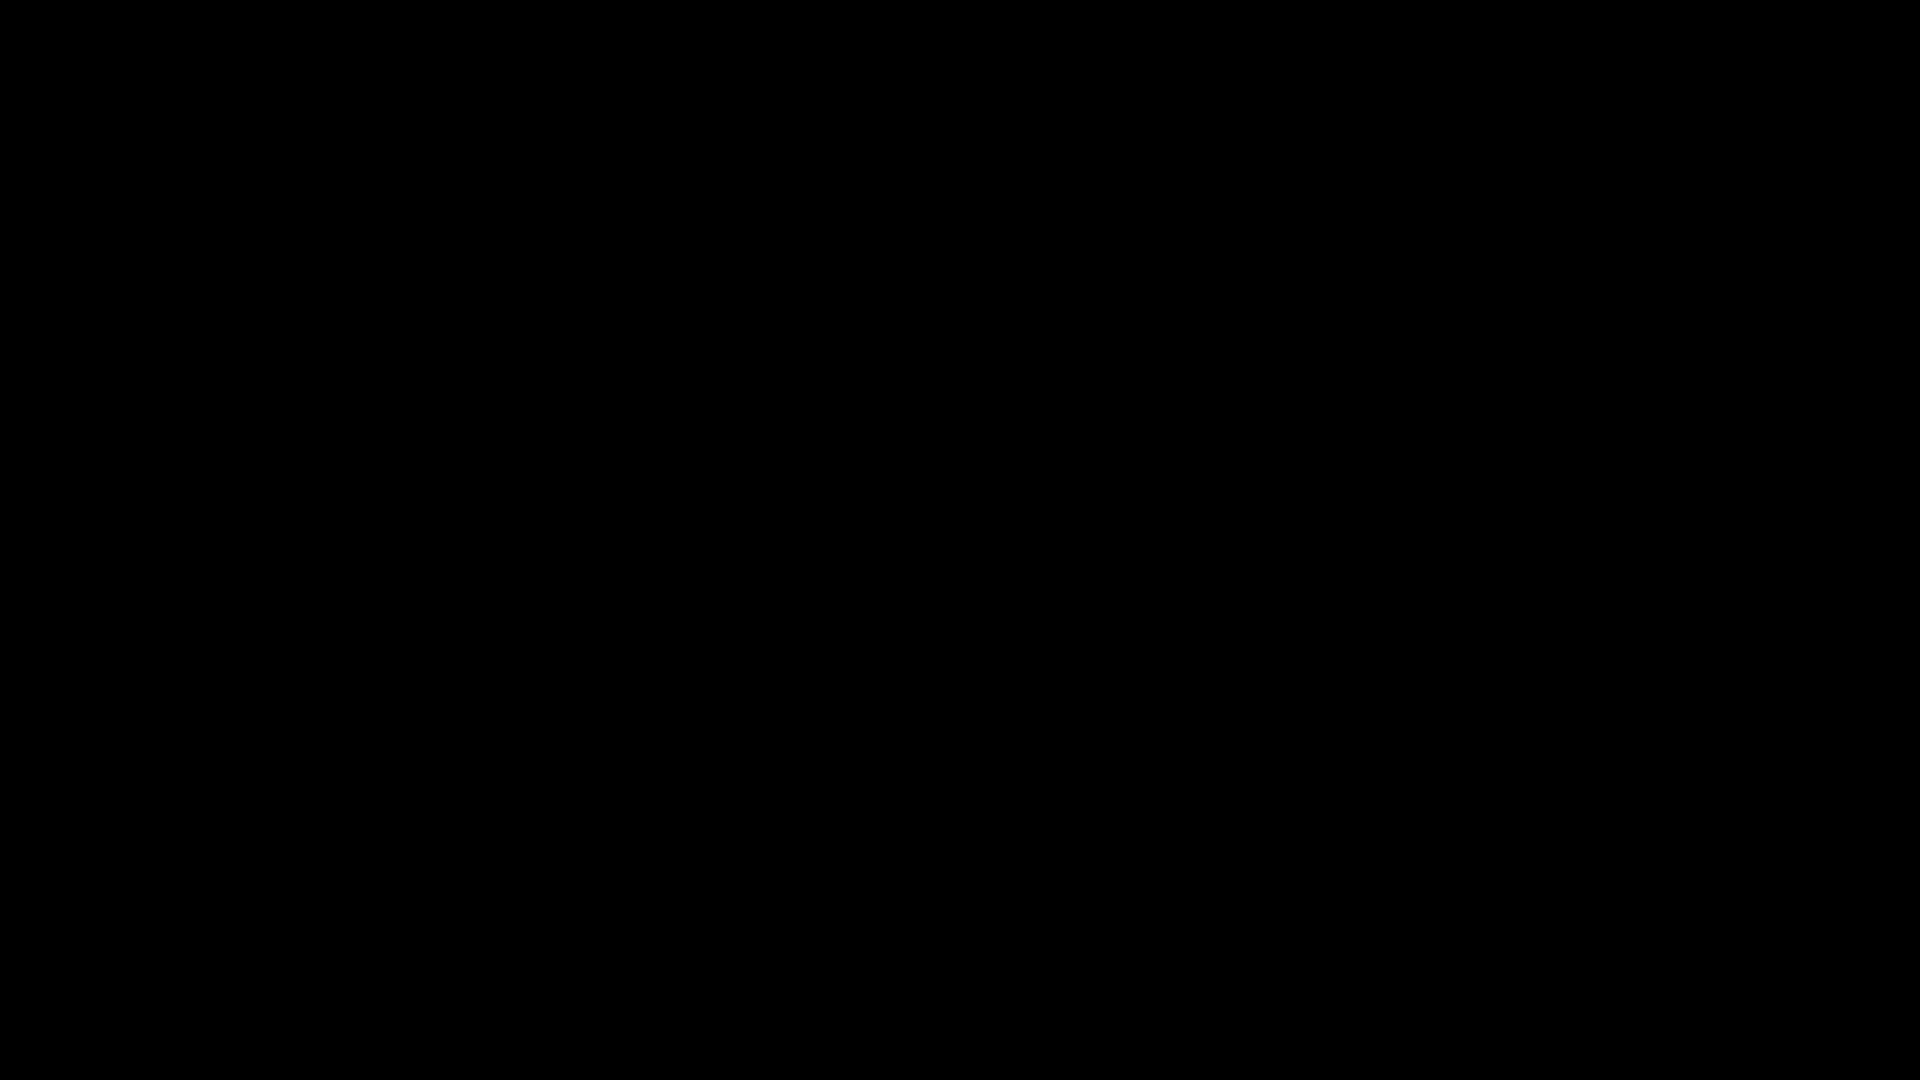 Black theme Wallpaper 1080p (70+ images)